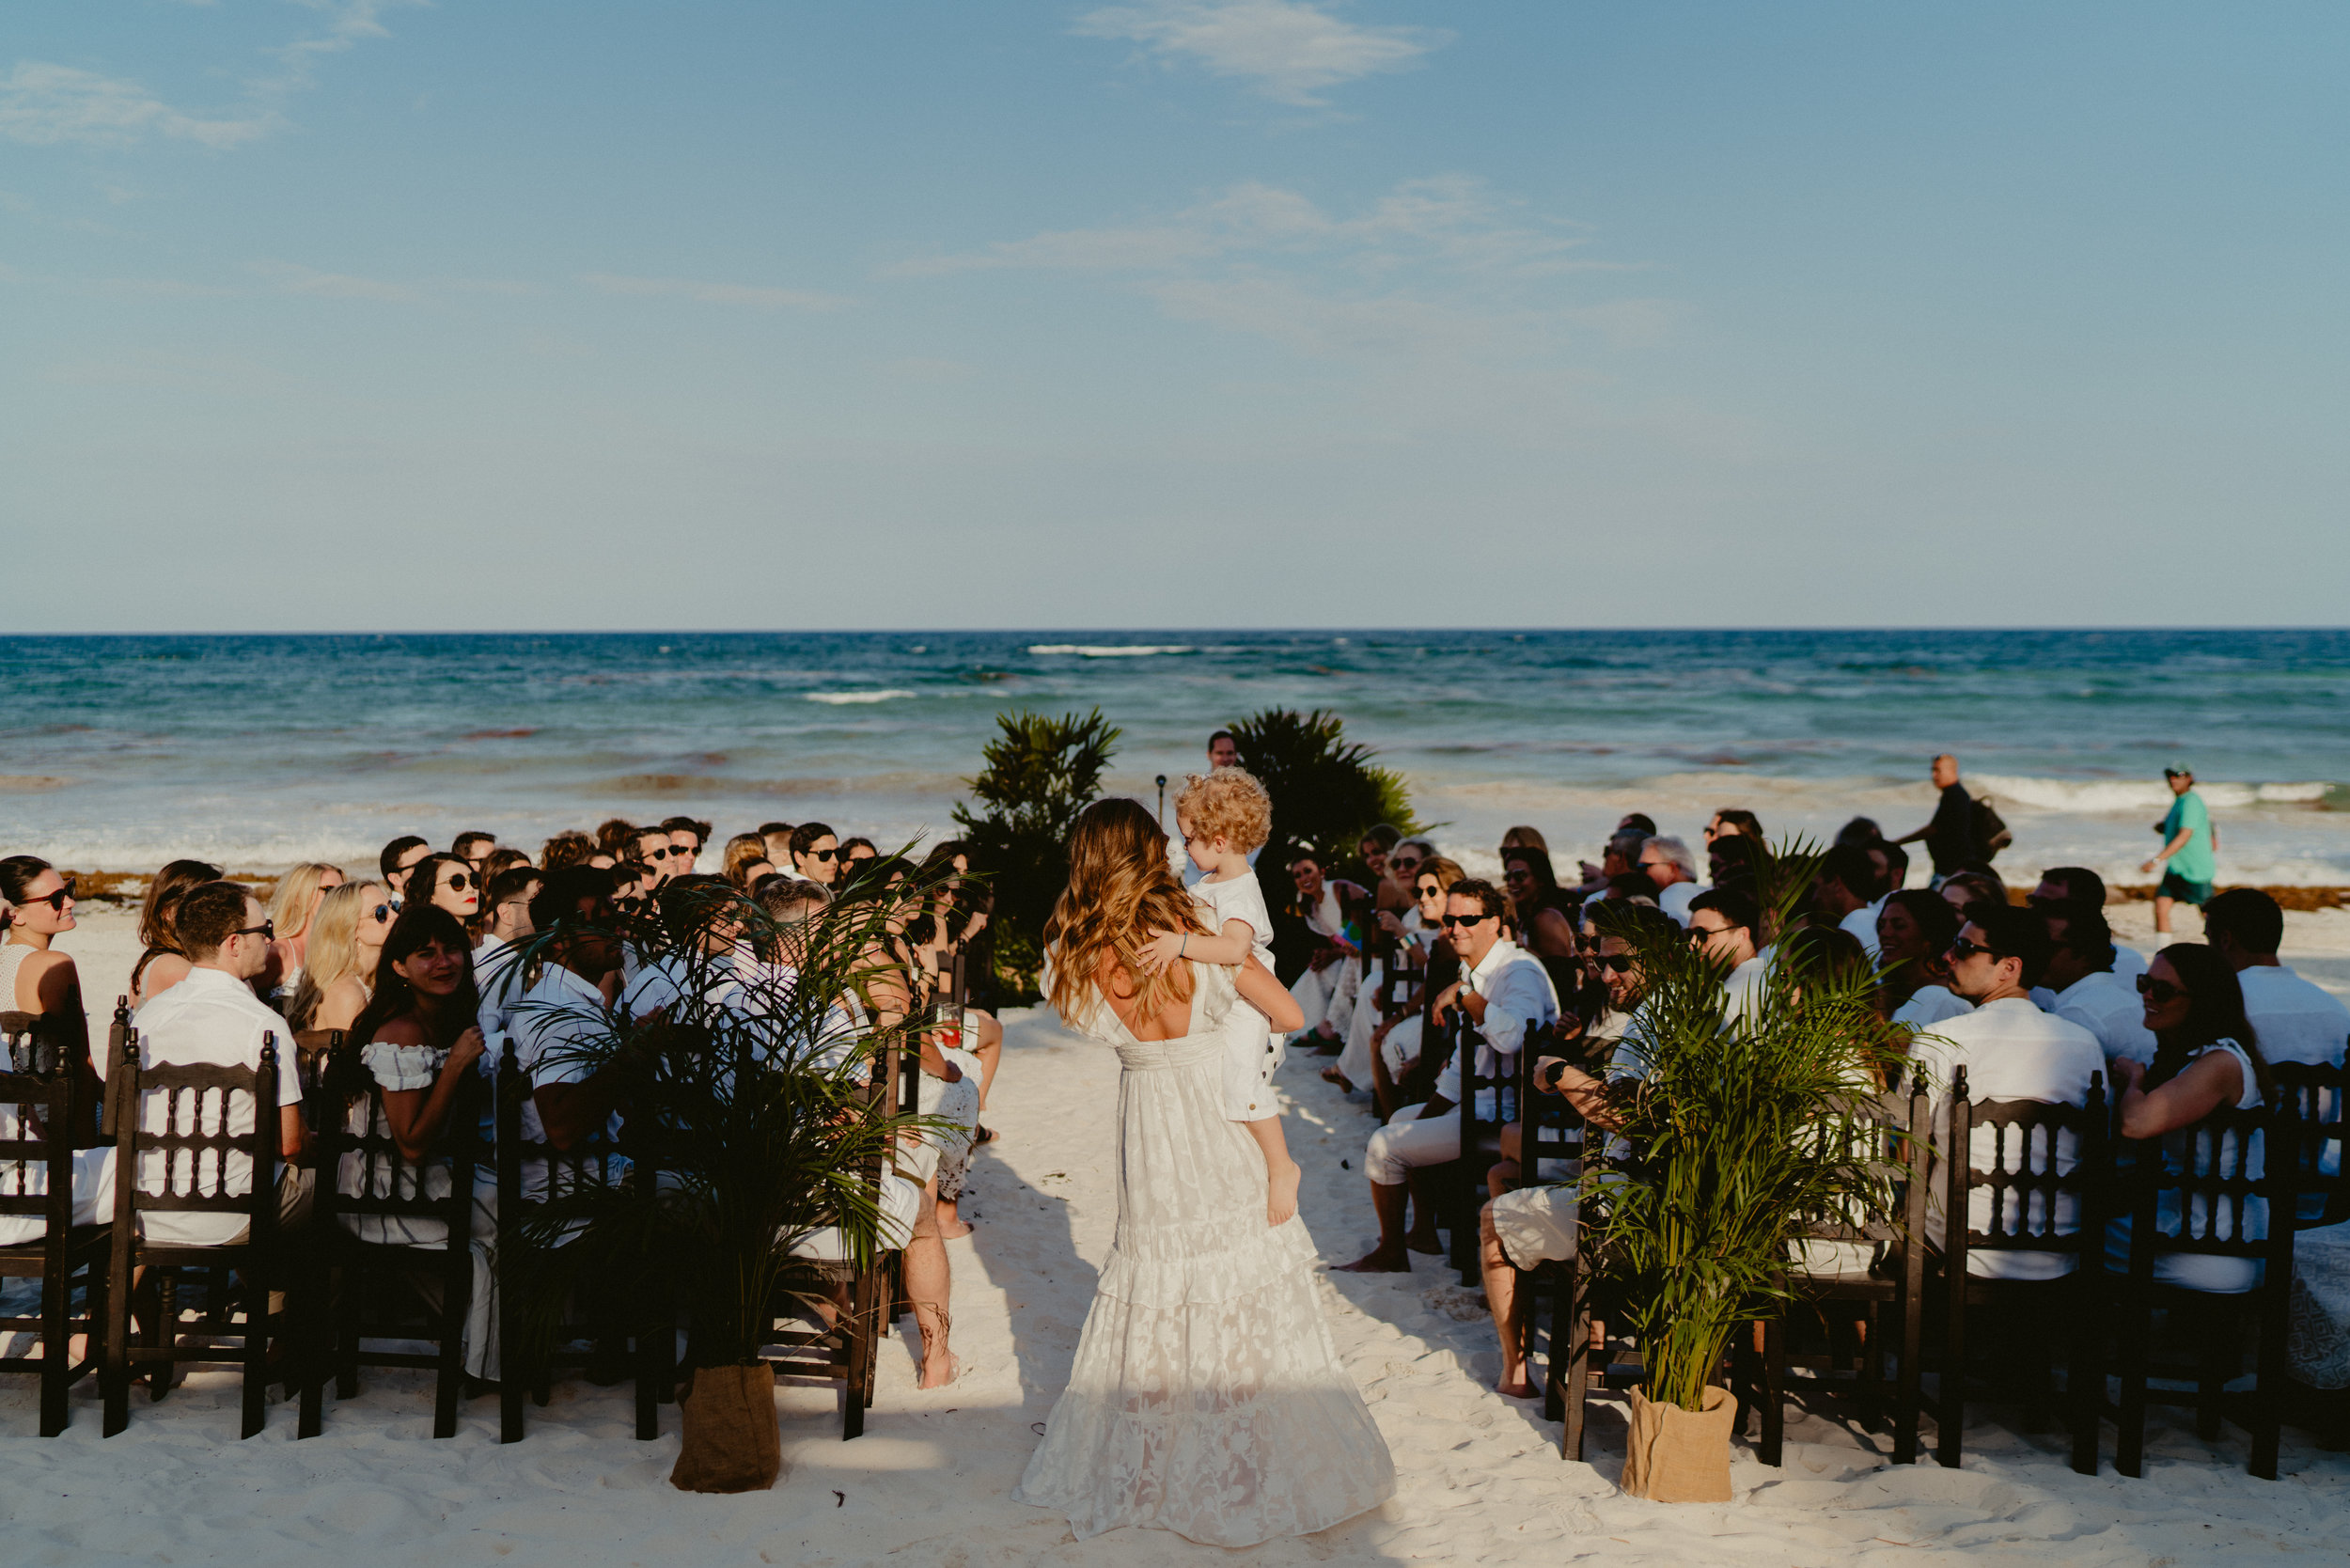 Joanna-and-Cameron_Ahua_Tulum_Wedding_Chellise_MIchael-Photography-267.jpg